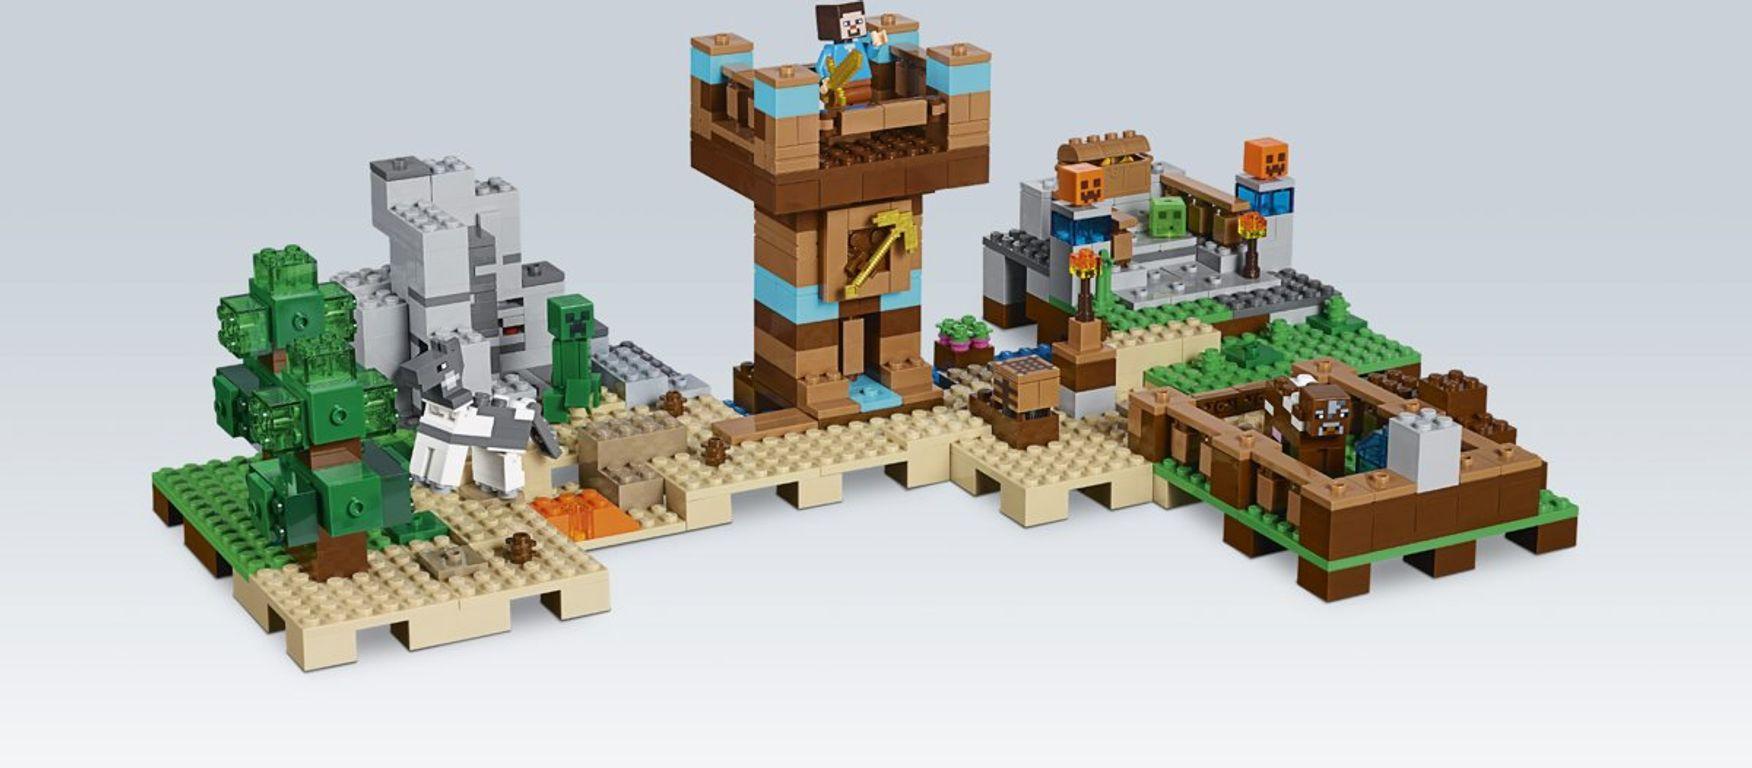 LEGO® Minecraft The Crafting Box 2.0 gameplay